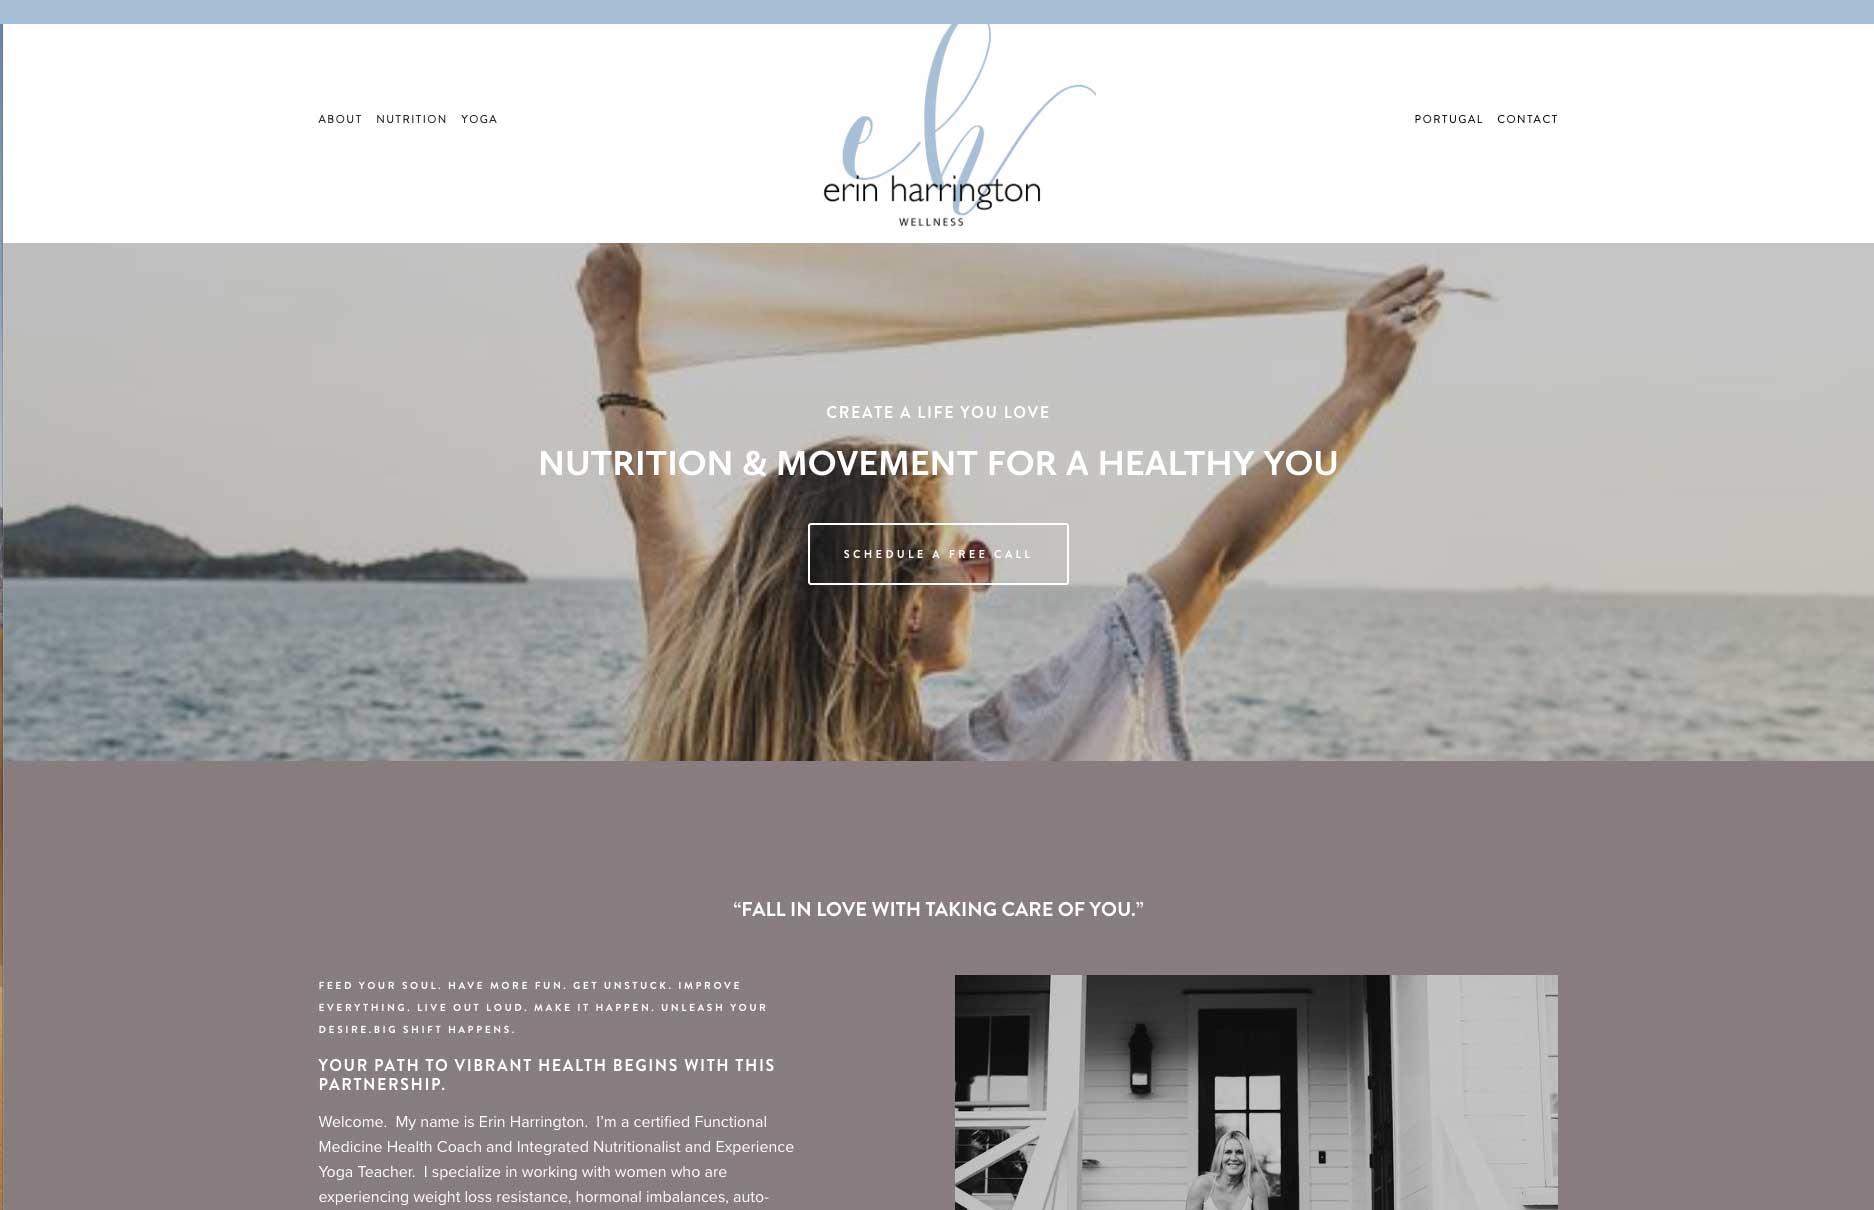 Erin Harrington Wellness Squarespace website by Caitilin McPhillips.